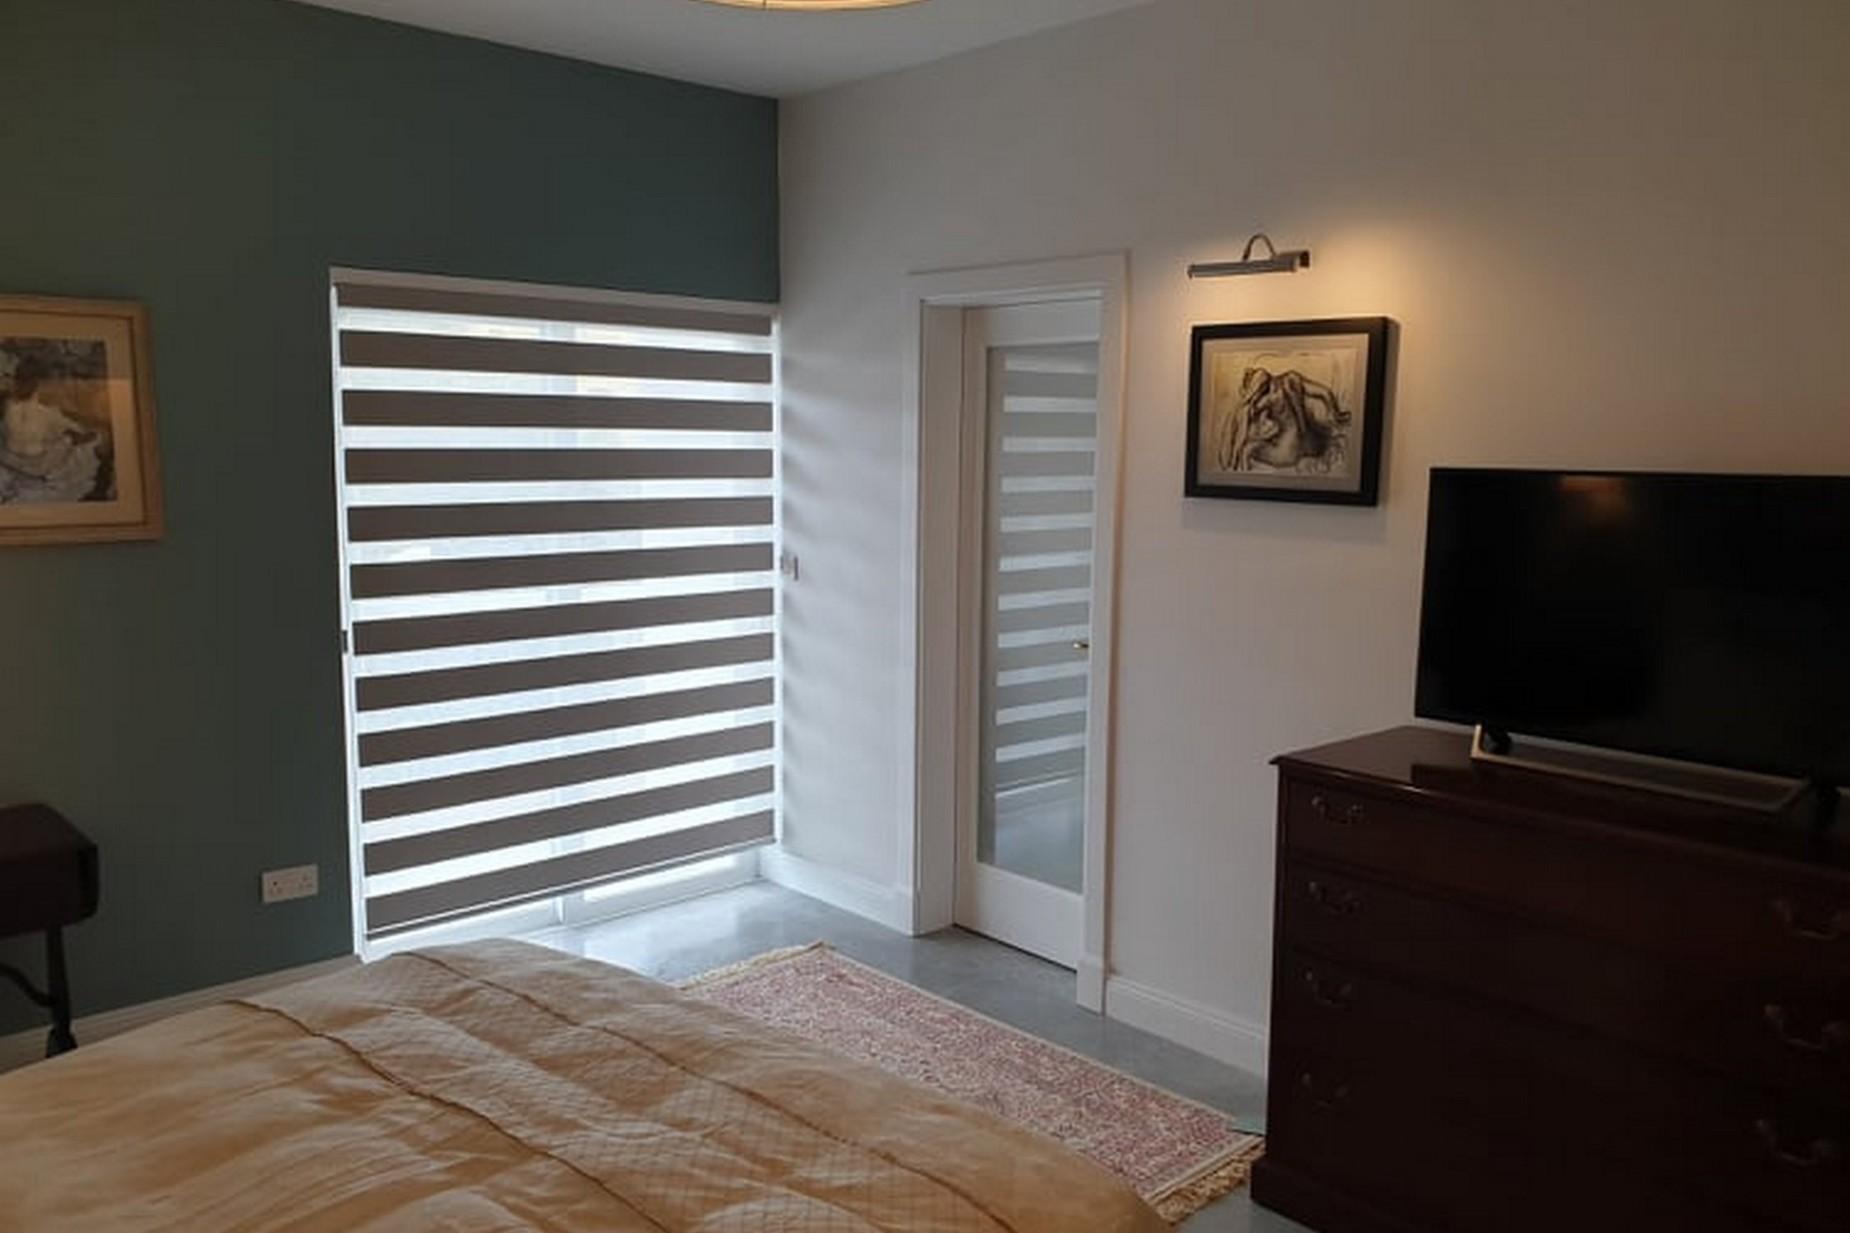 3 bed Apartment For Rent in Birkirkara, Birkirkara - thumb 27